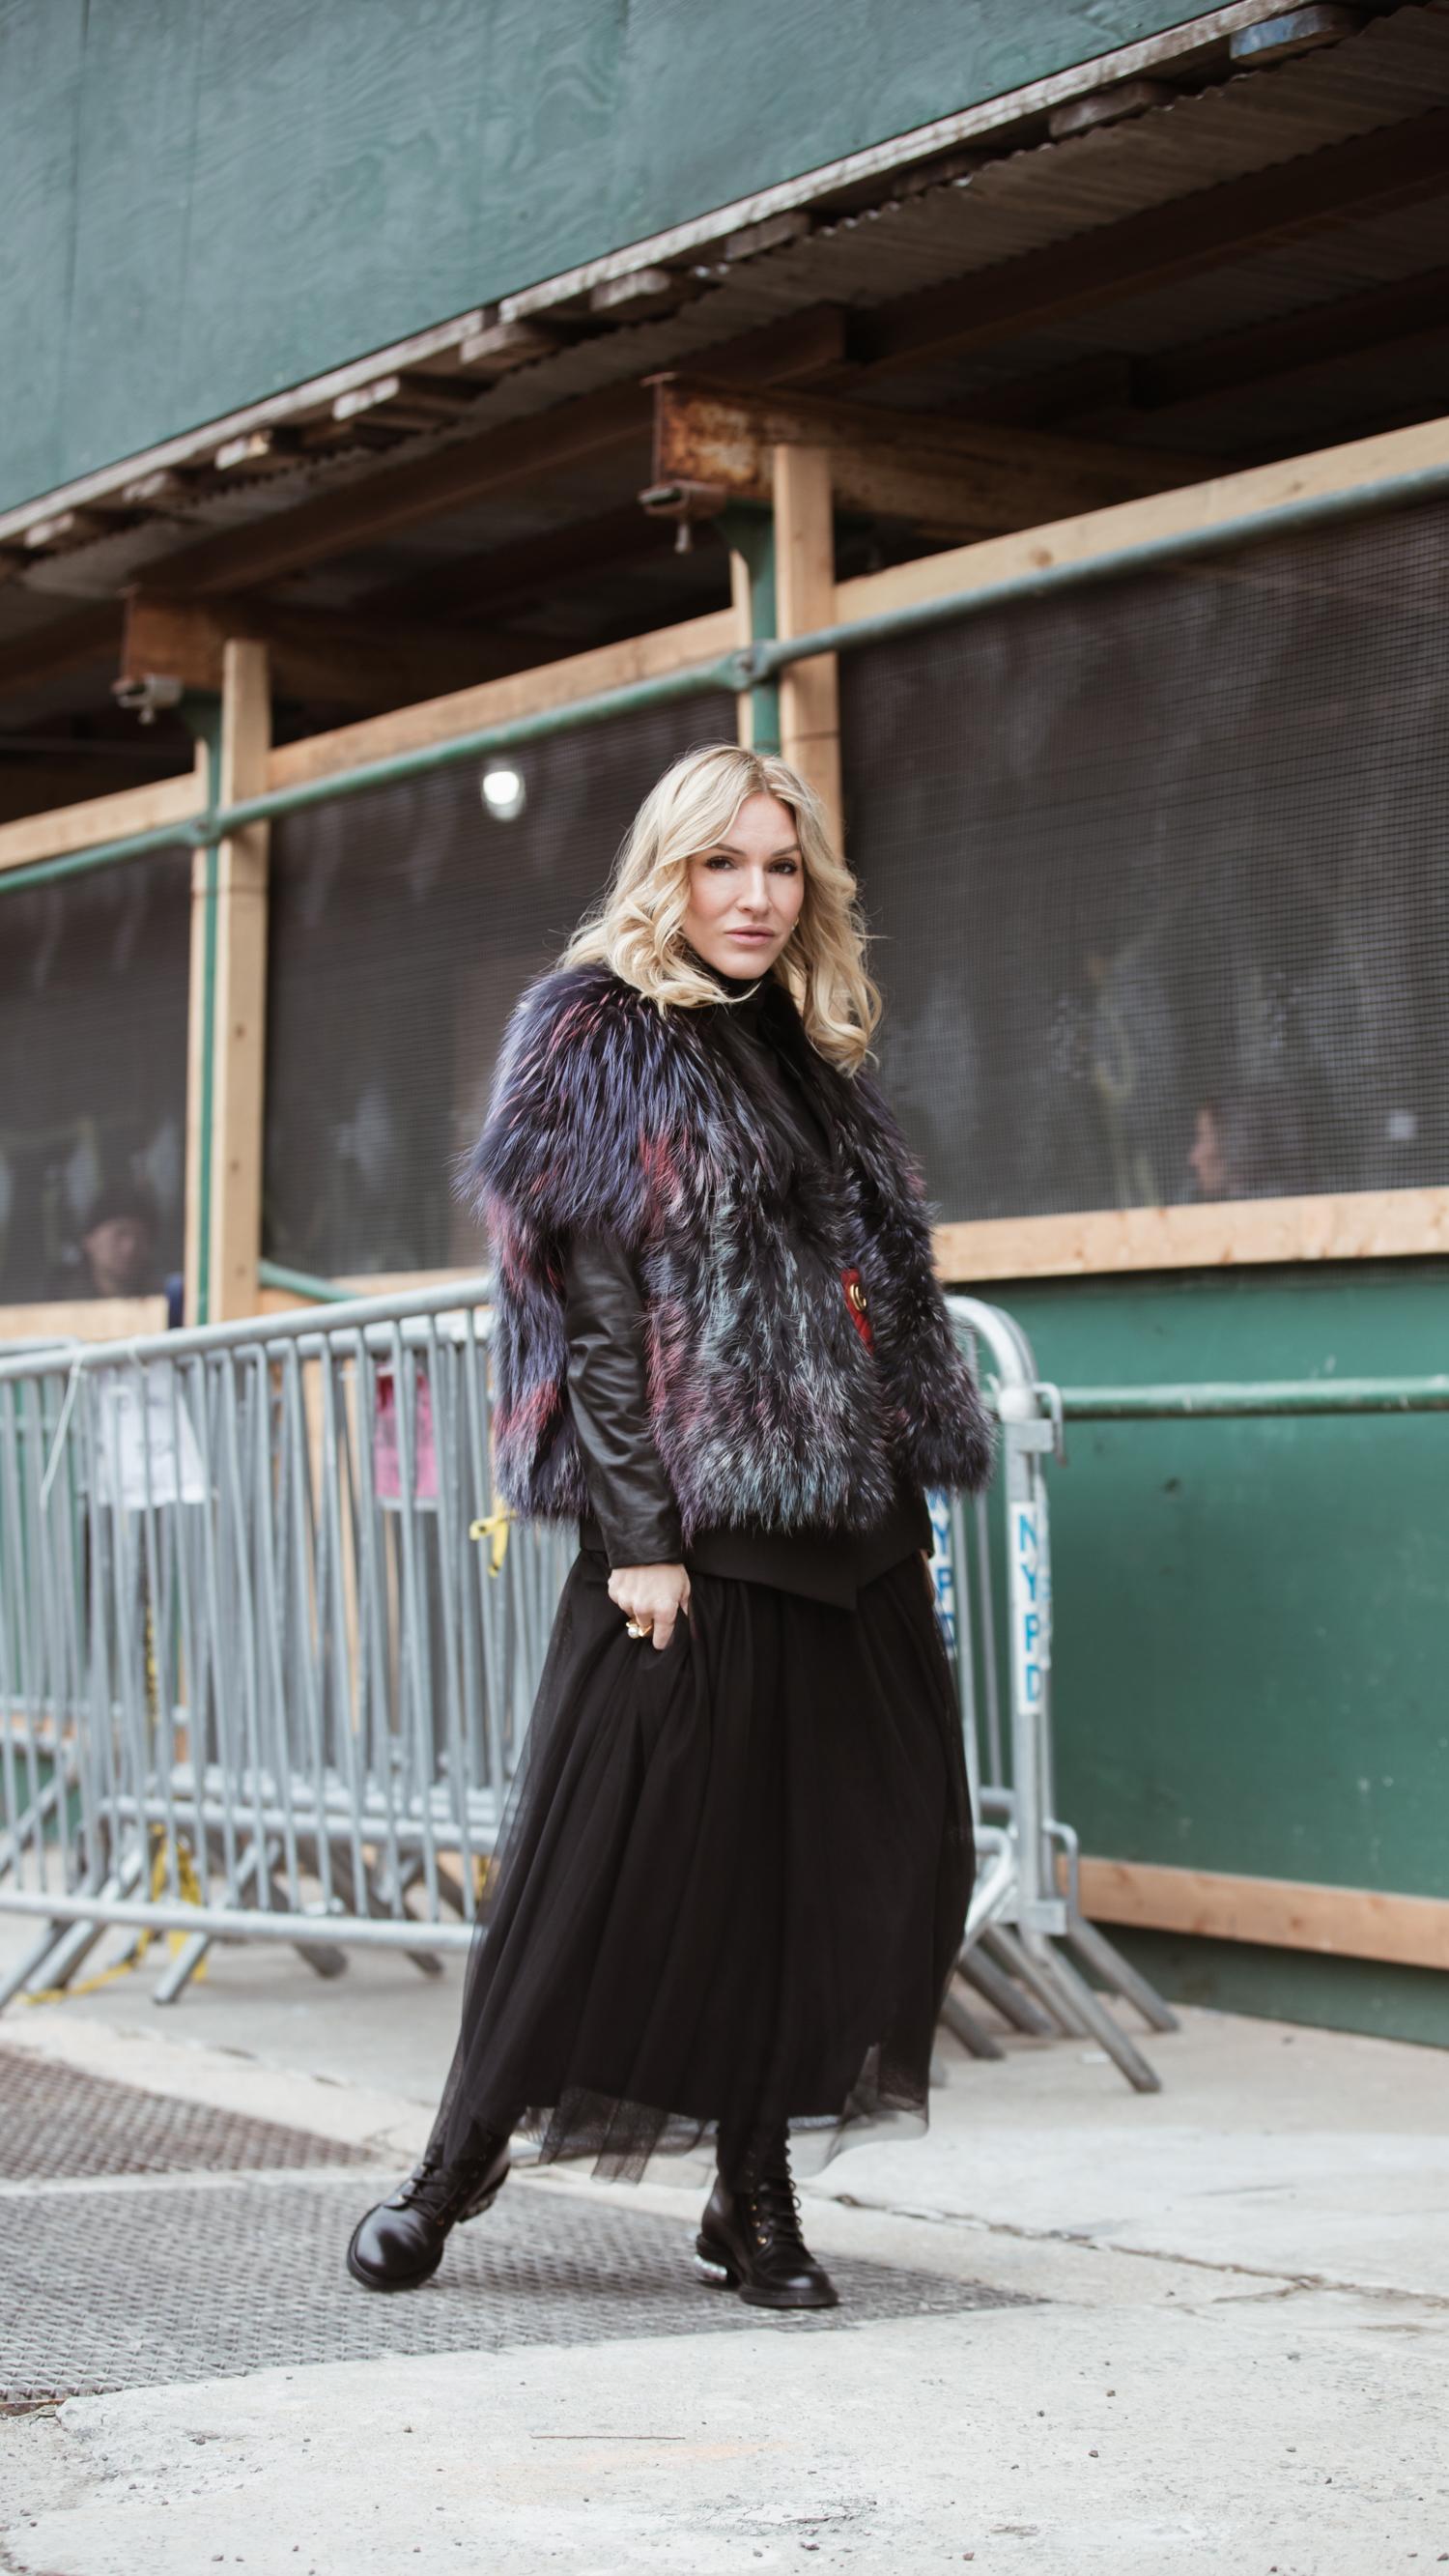 fur:  Lysa Lash Fur  - boots:  Nicholas Kirkwood  - skirt:  Bailey 44  - blazer:  Helmut Lang  - purse:  Gucci Belt Bag